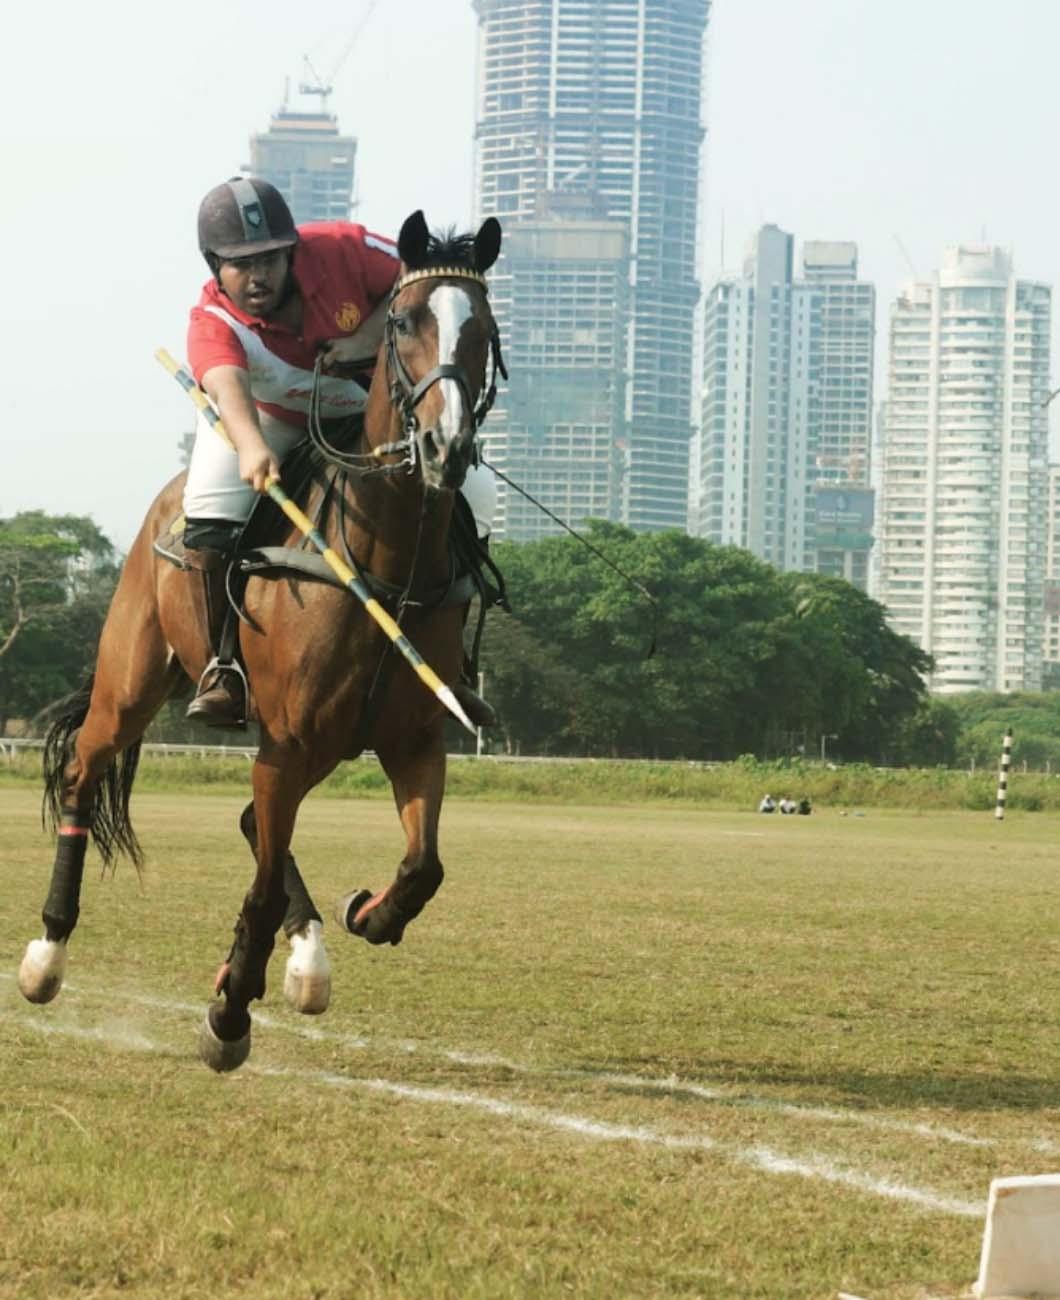 horse-activity-la-polo